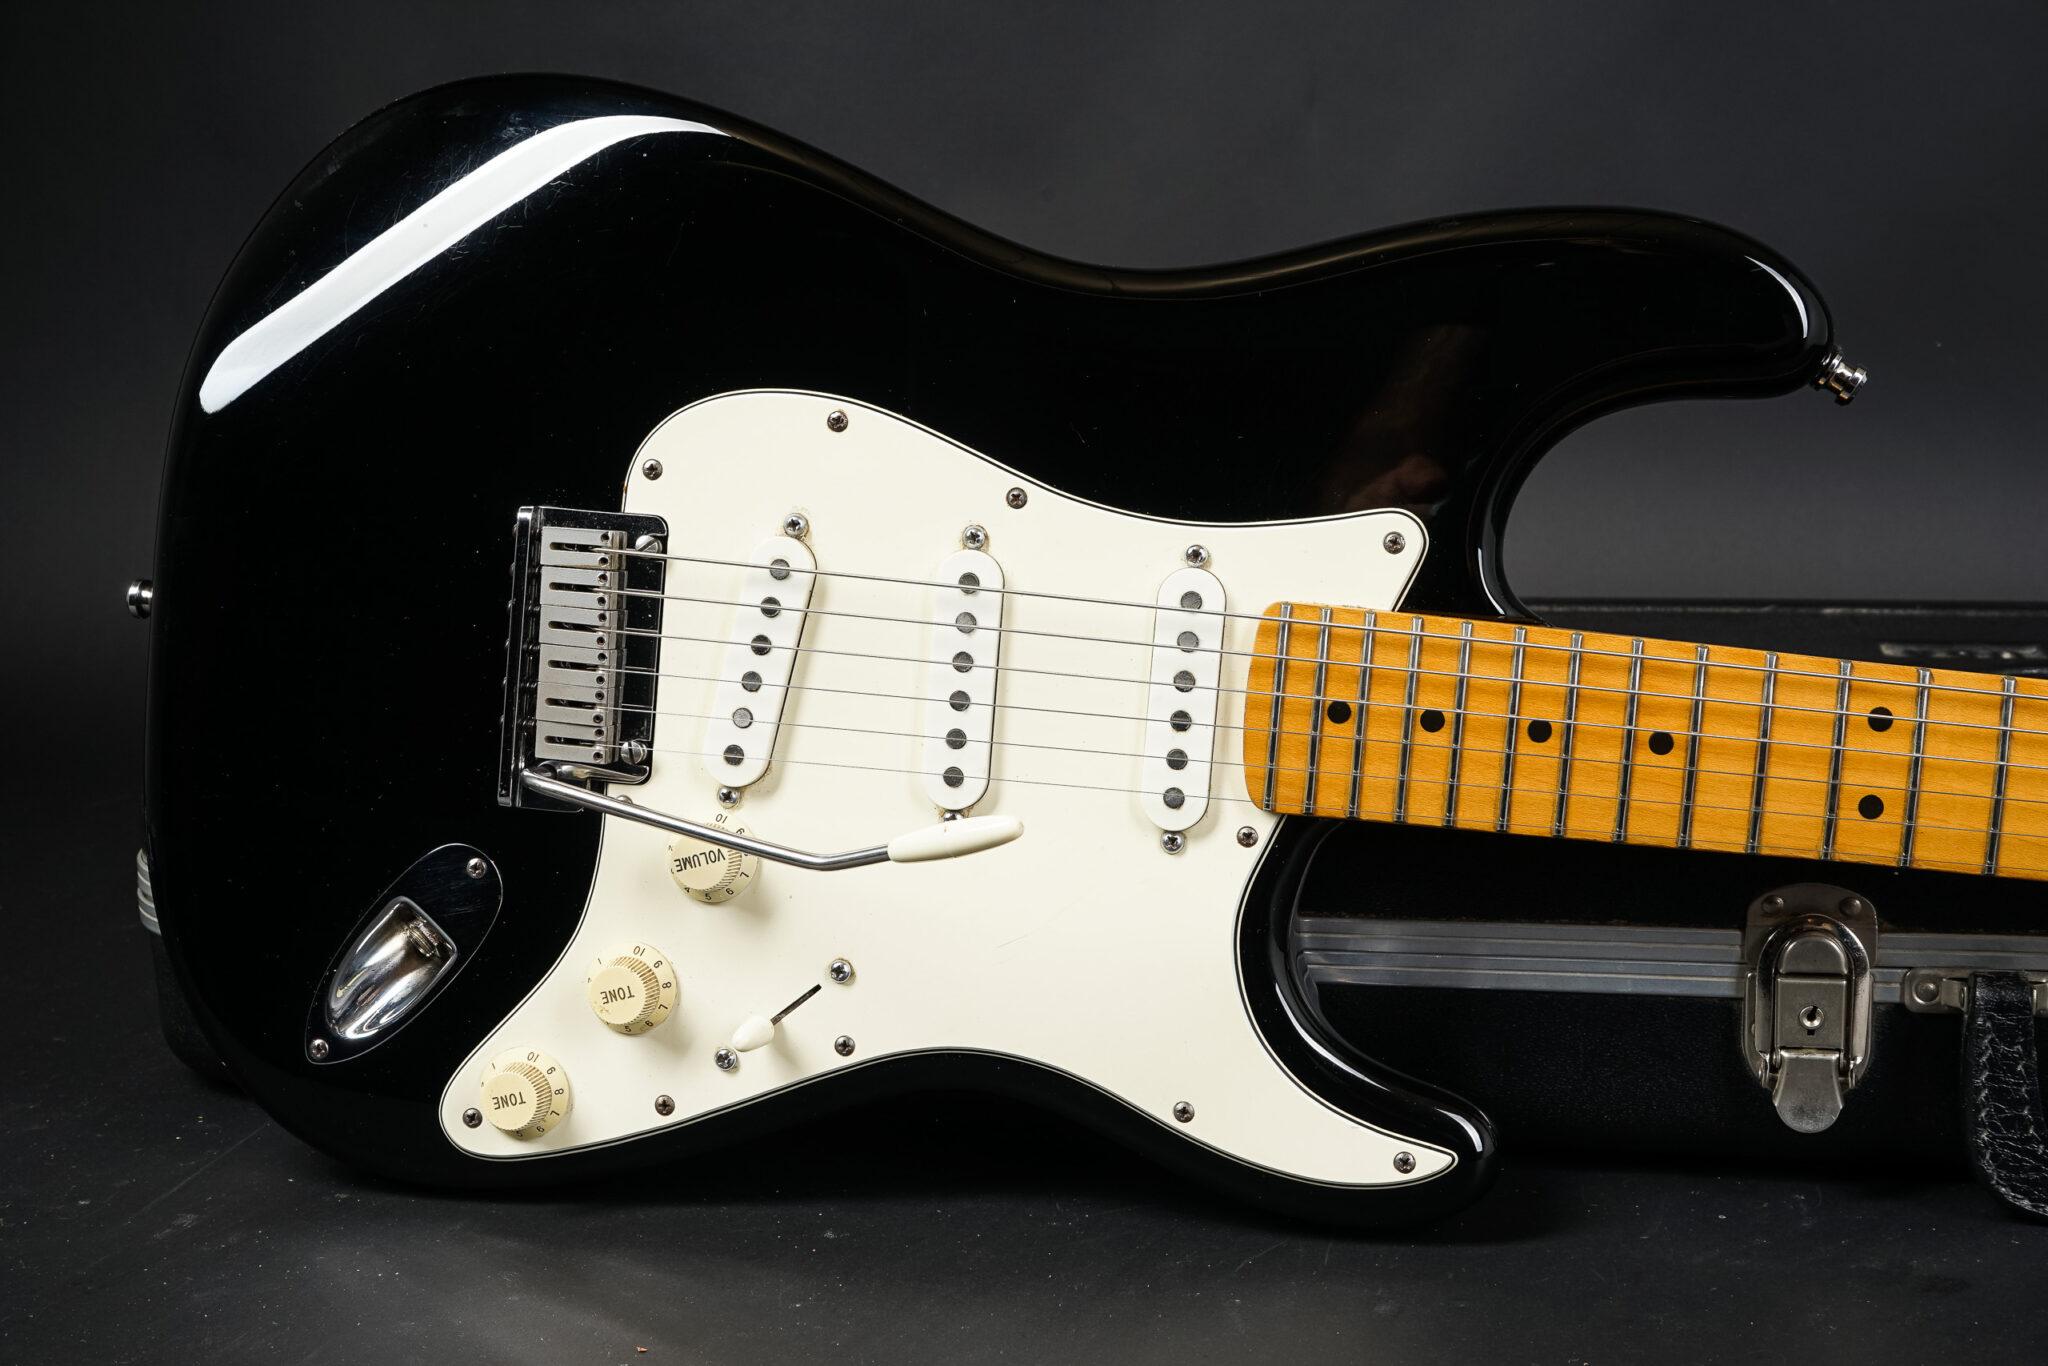 https://guitarpoint.de/app/uploads/products/1984-fender-stratocaster-standard-usa-e430594/1987-Fender-Standard-Stratocaster-Blackie-7-2048x1366.jpg